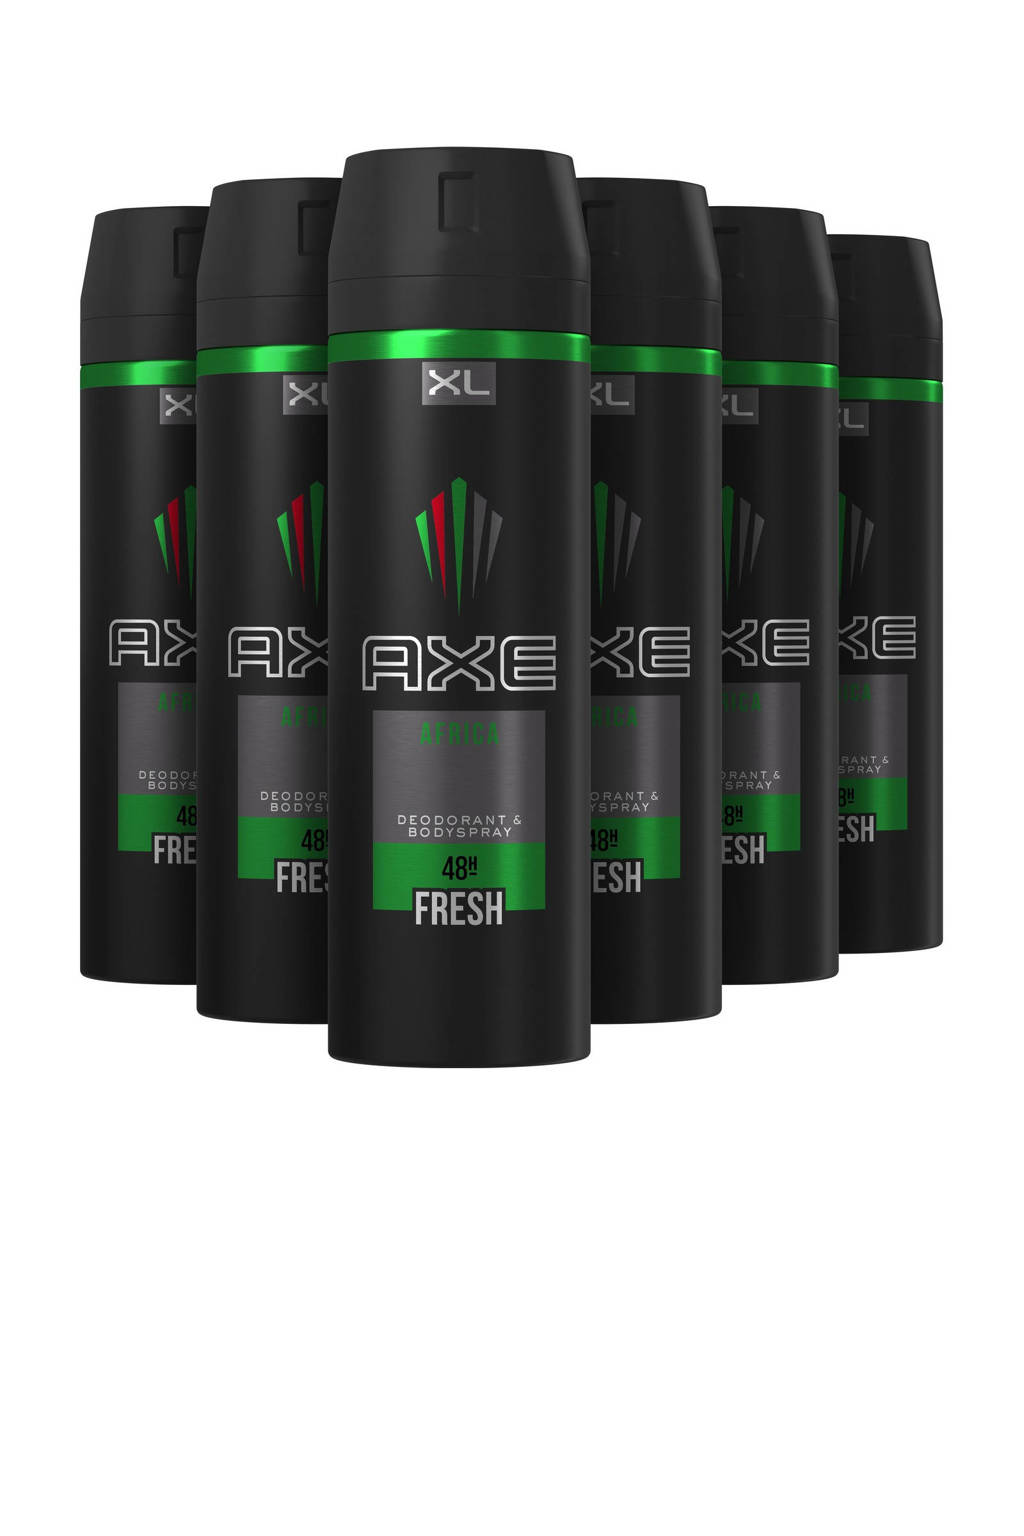 Axe Africa bodyspray deodorant - 6 x 200 ml